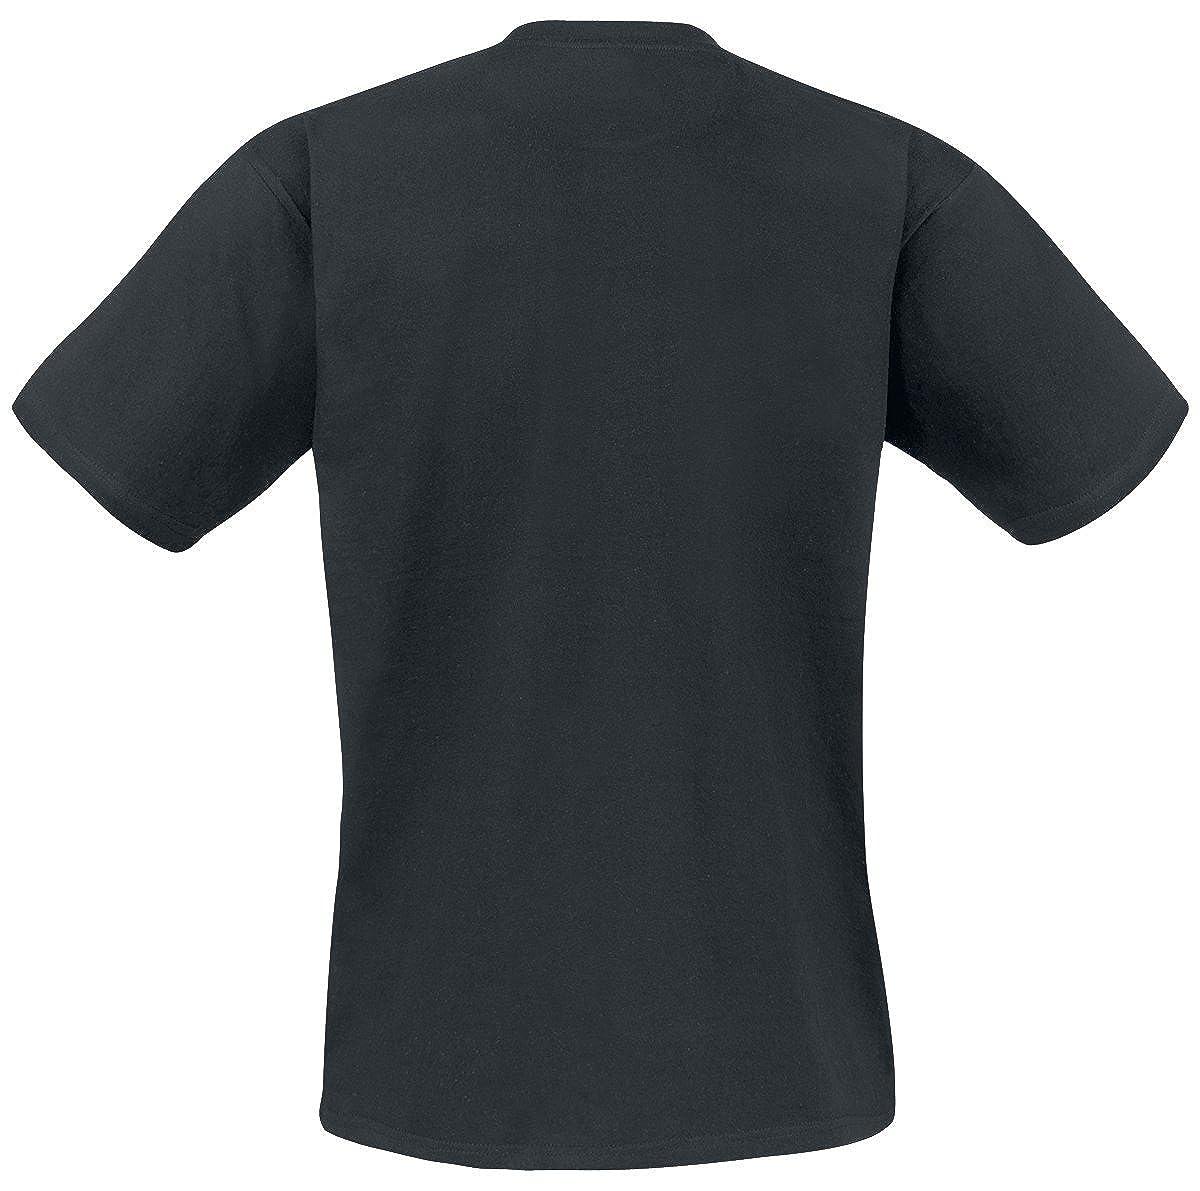 05207f91cc6 The Big Bang Theory T Shirt Rock Paper Scissors Lizard Spock Official Mens  Black: Amazon.ca: Clothing & Accessories